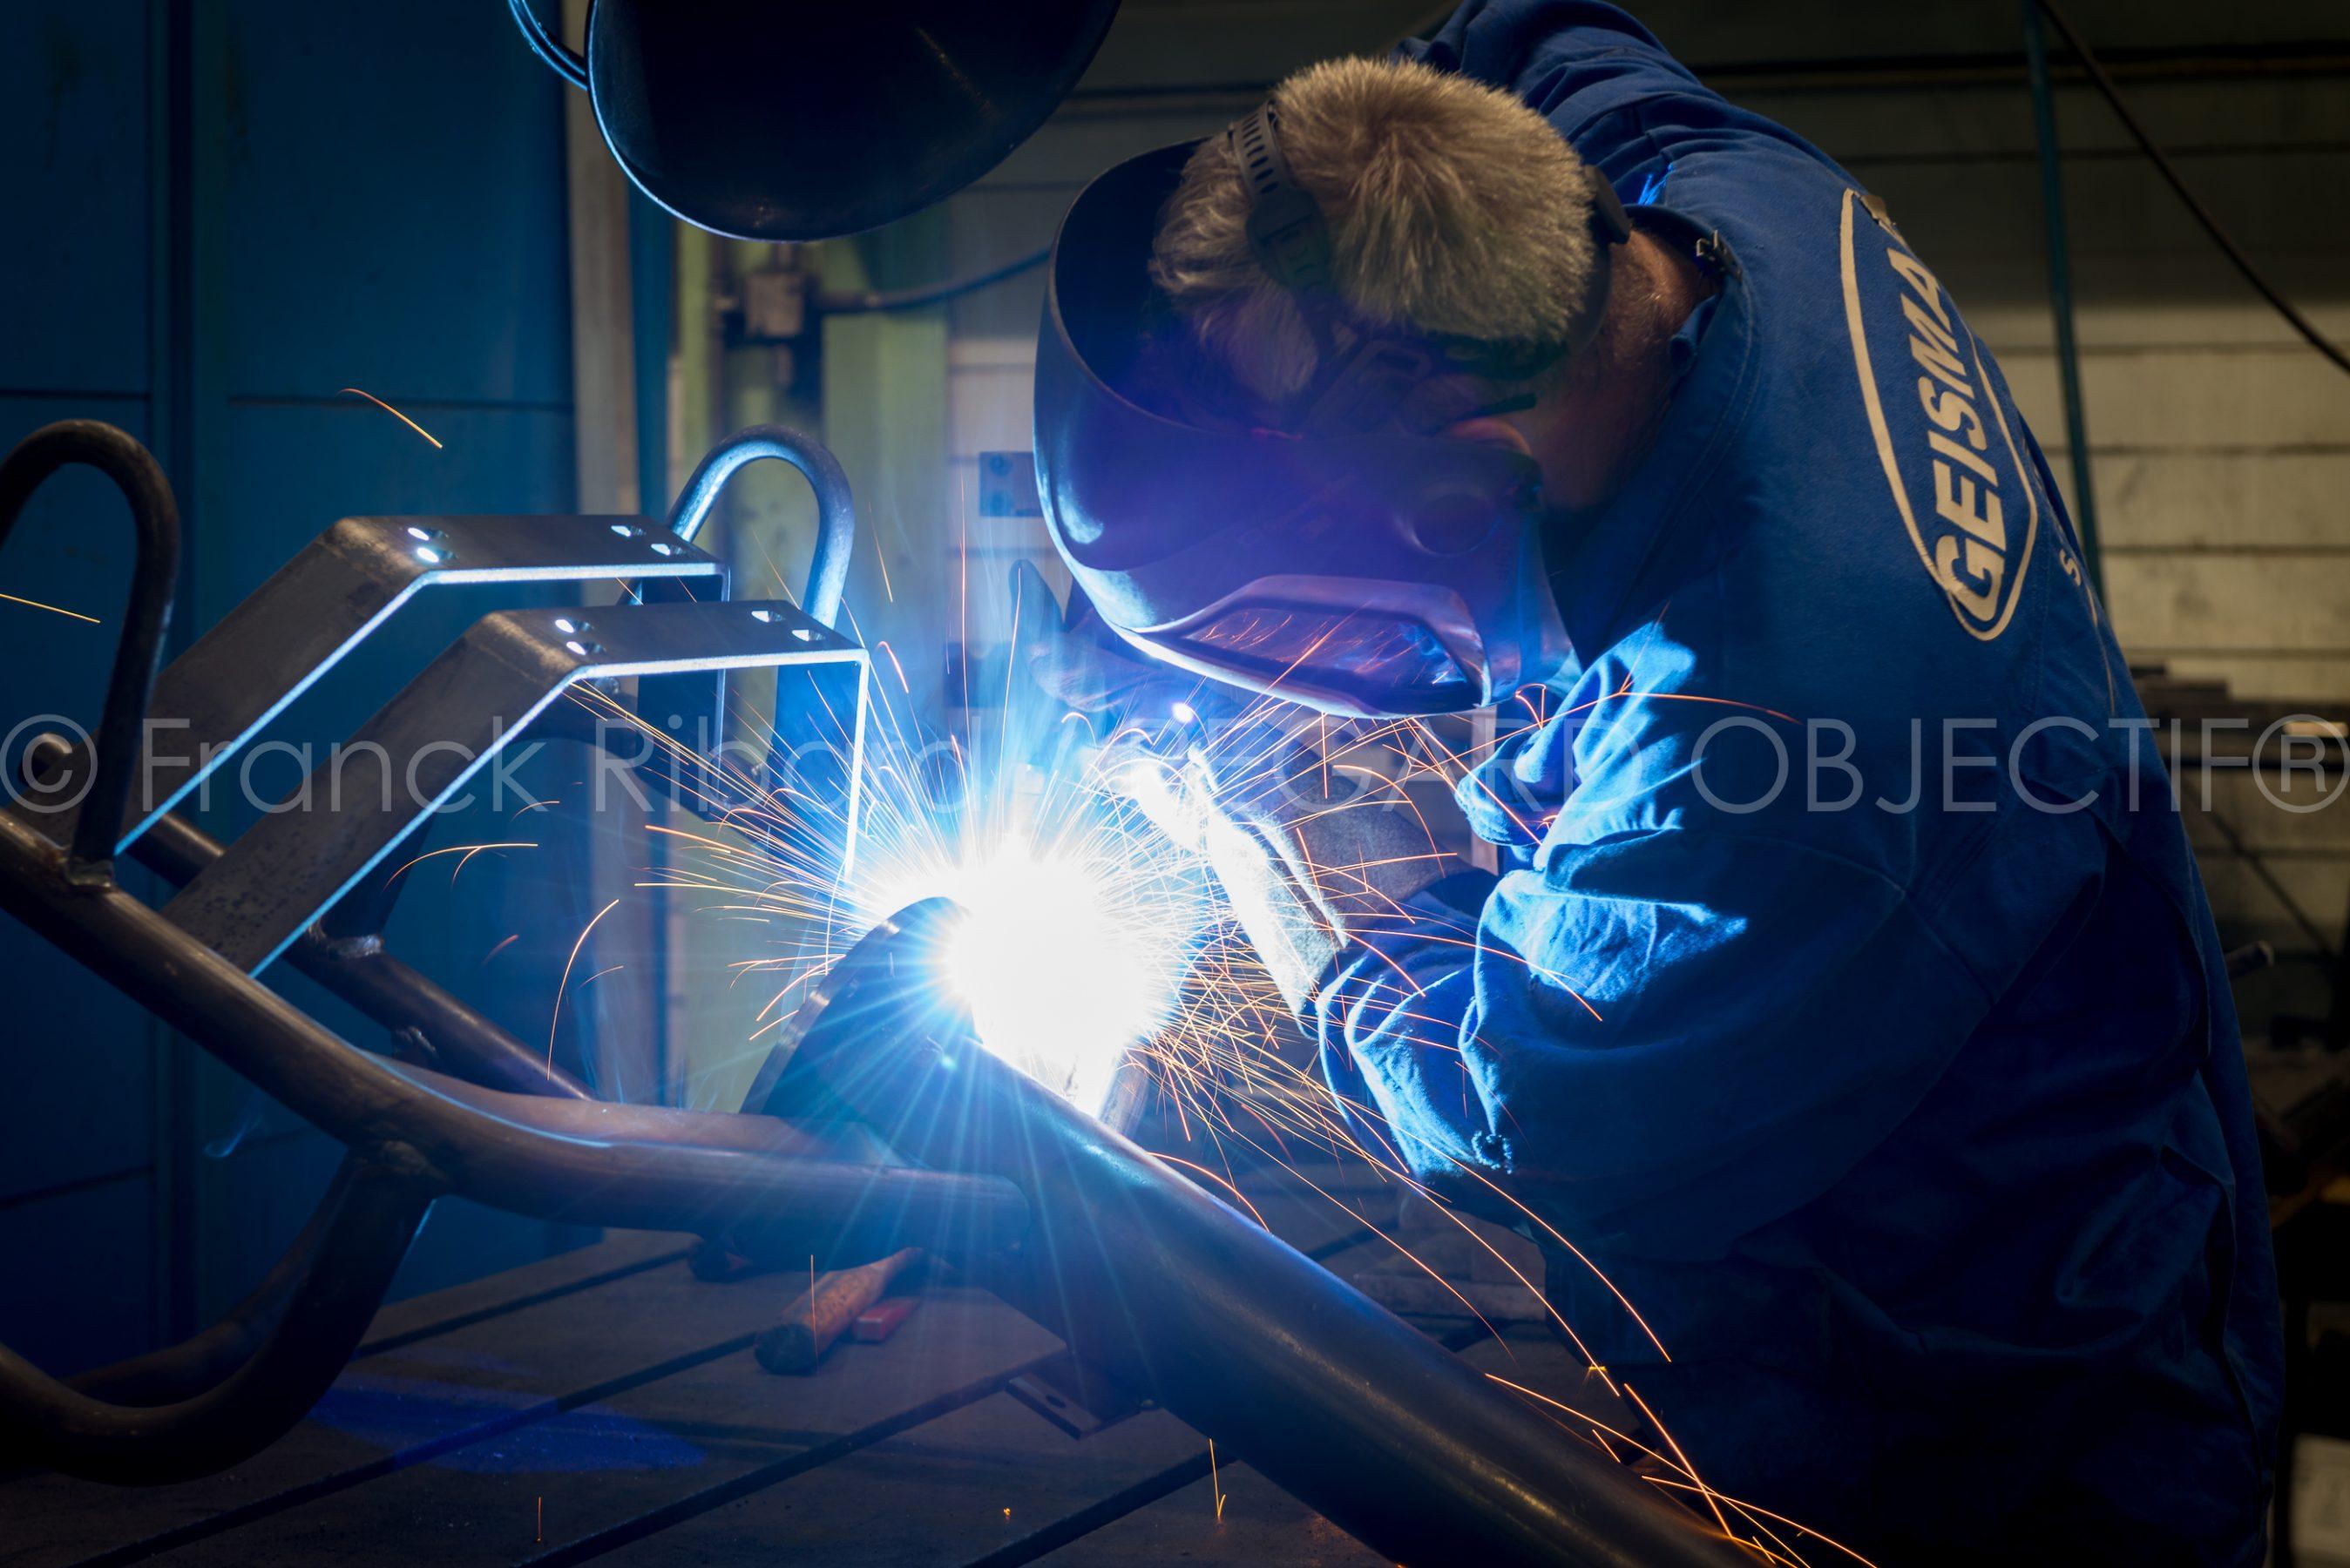 photographie de Franck Ribard - regard objectif - photographe industriel Lyon - Geismar